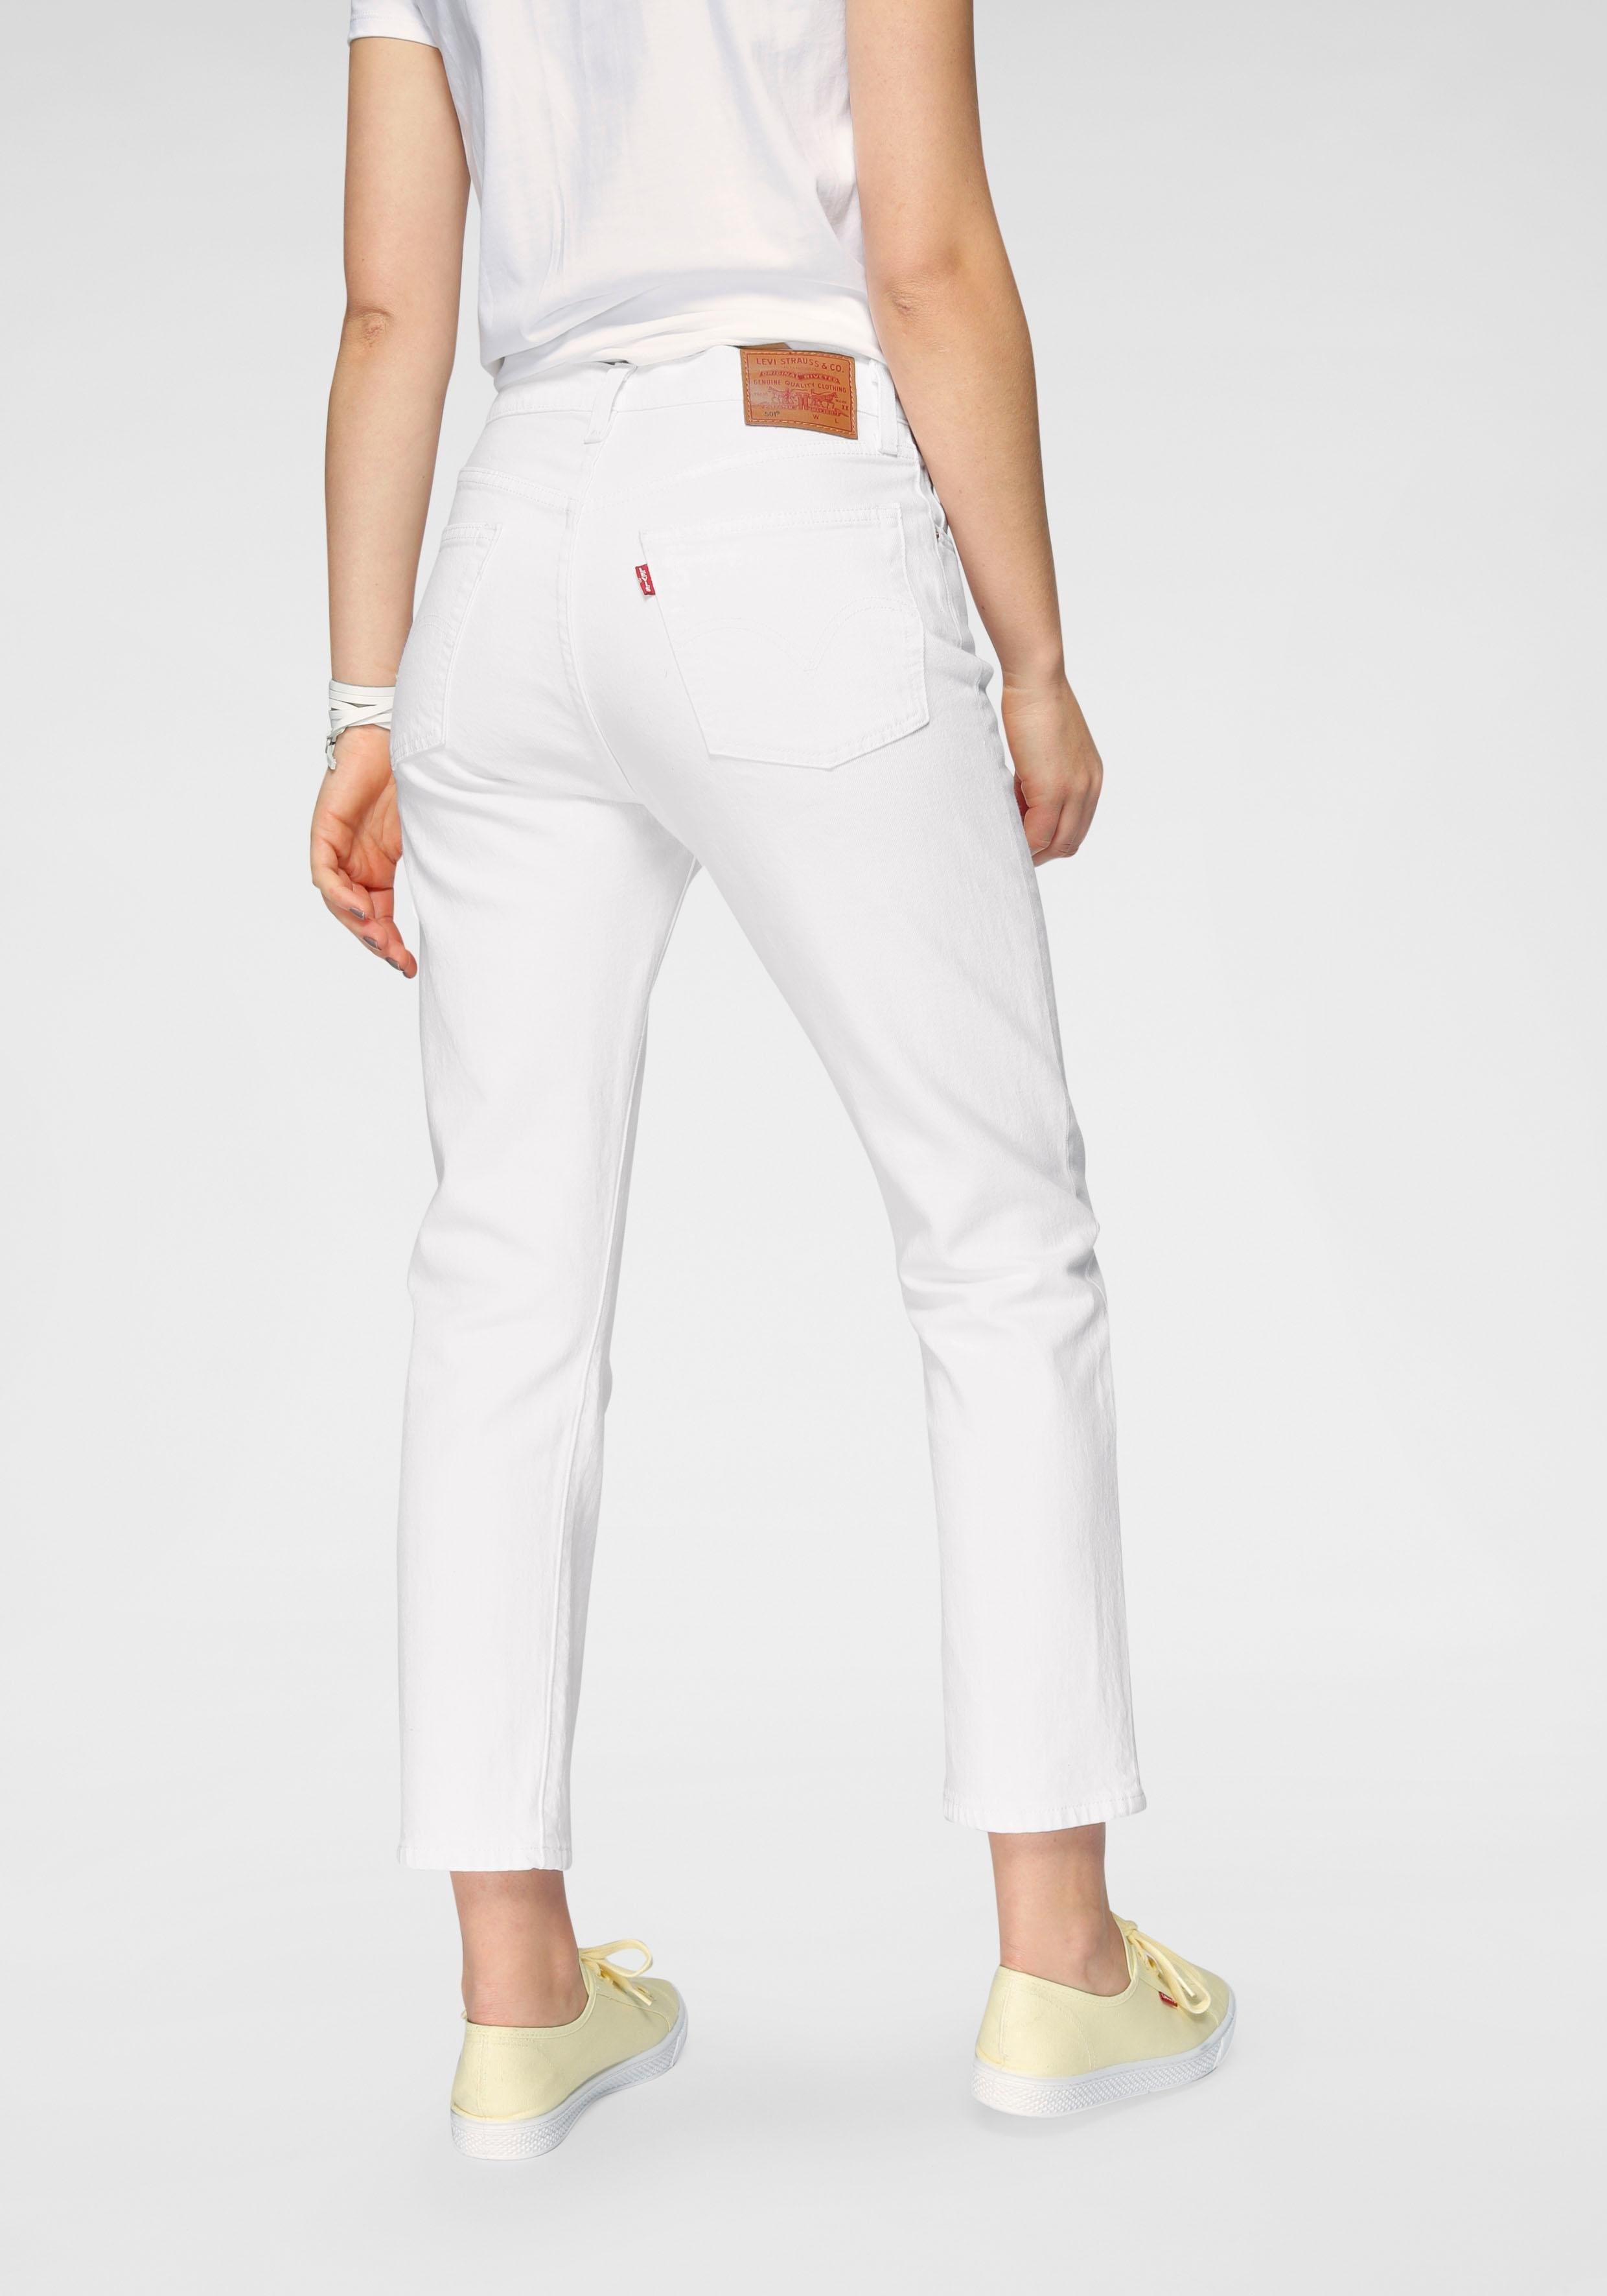 Levi's 7/8 jeans 501 Crop - by GNTM goedkoop op otto.nl kopen